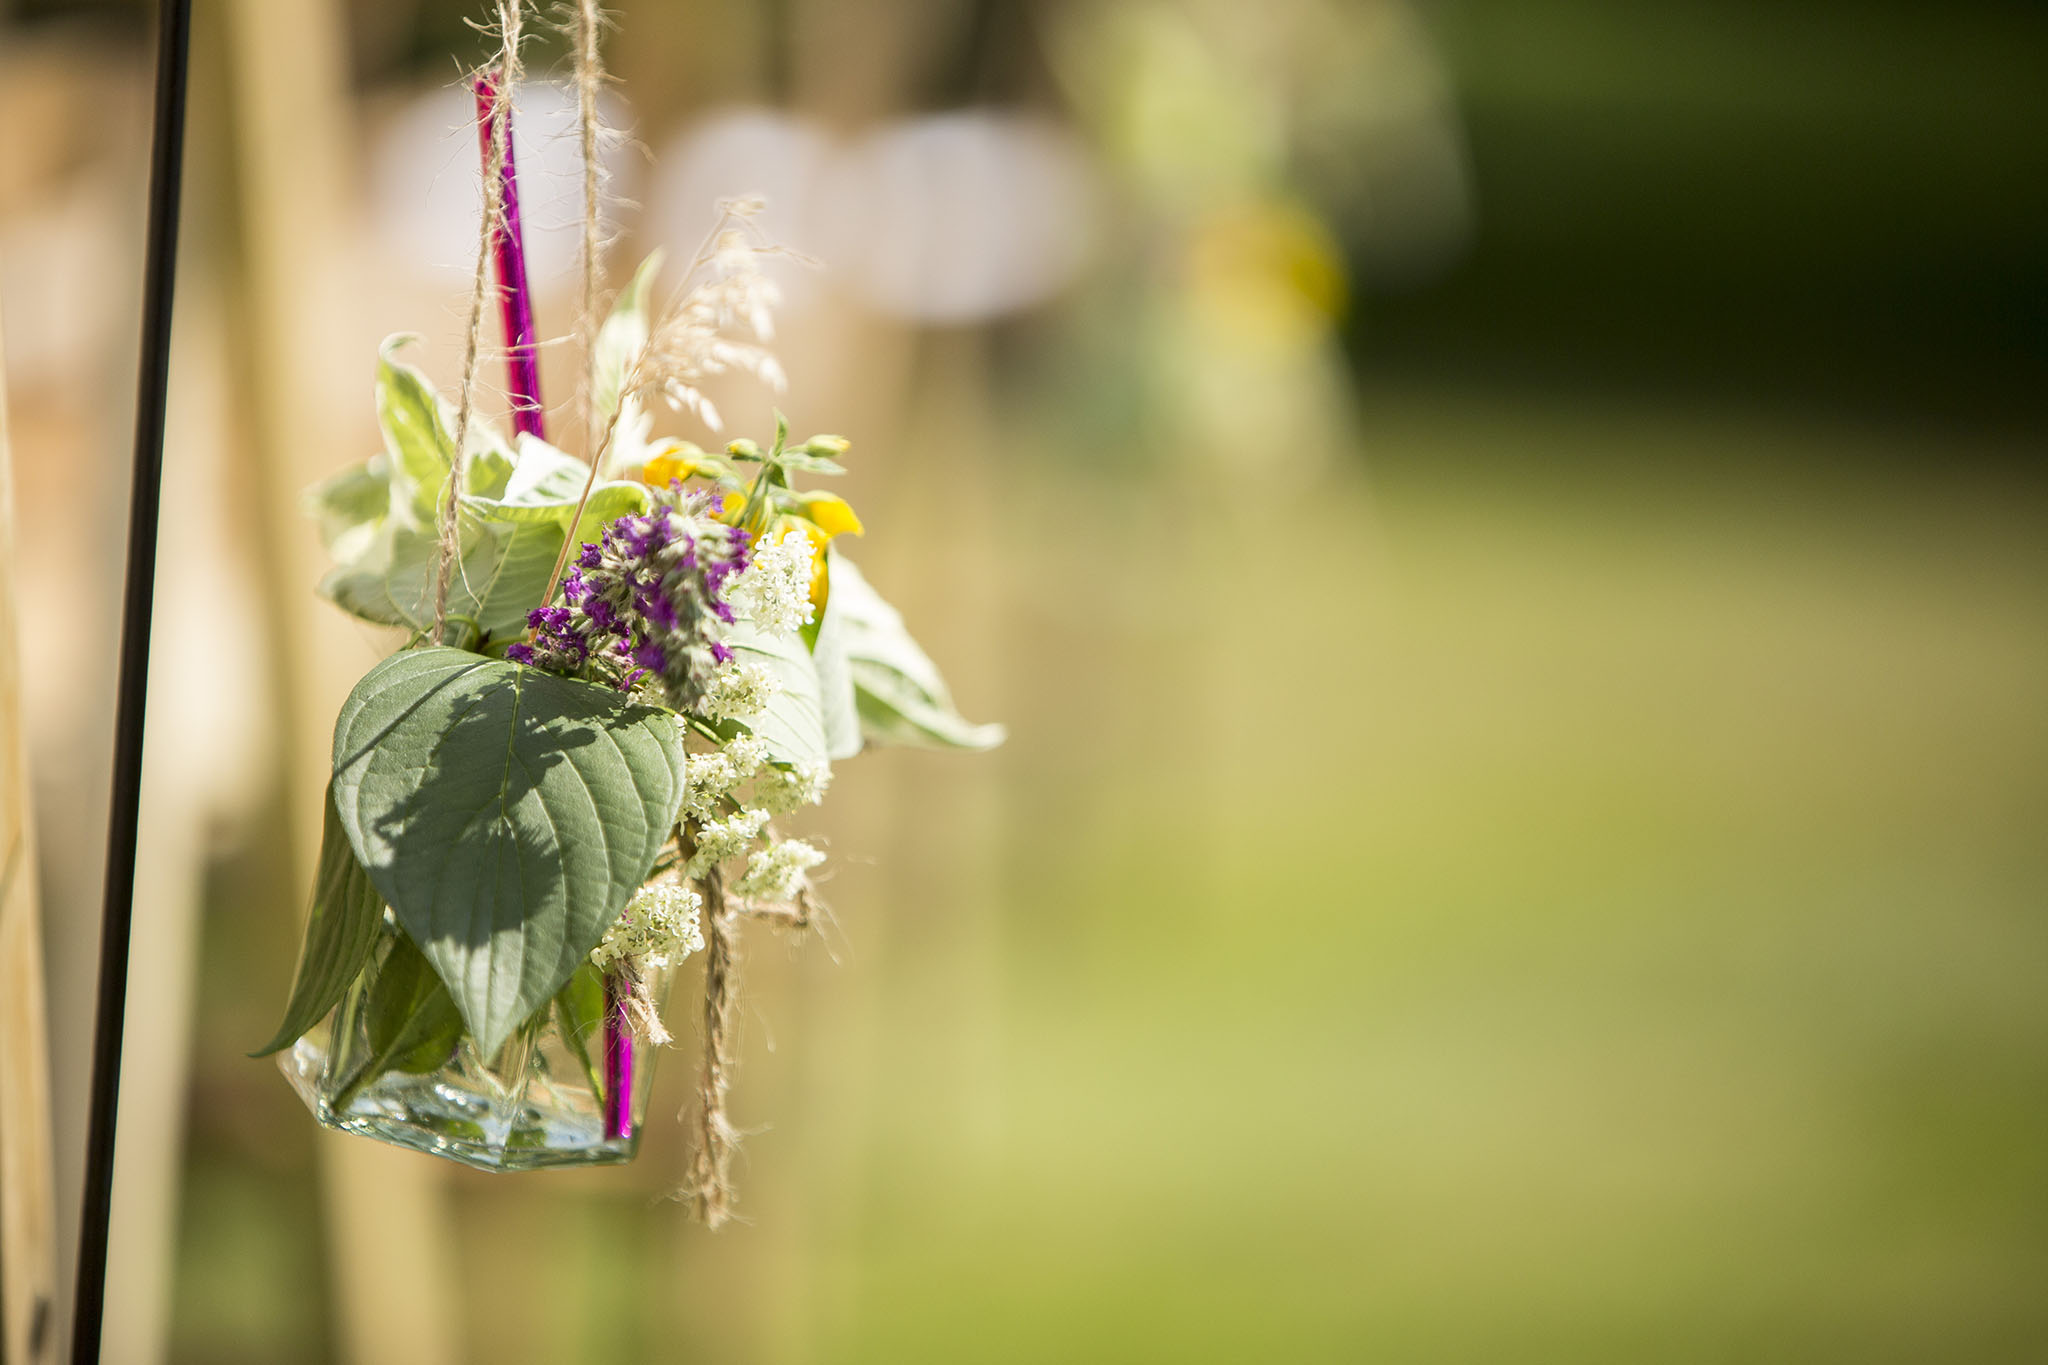 elizabethgphotography_kingslangley_hertfordshire_fineart_wedding_pottersbar_matt_katie_pegg_06.jpg